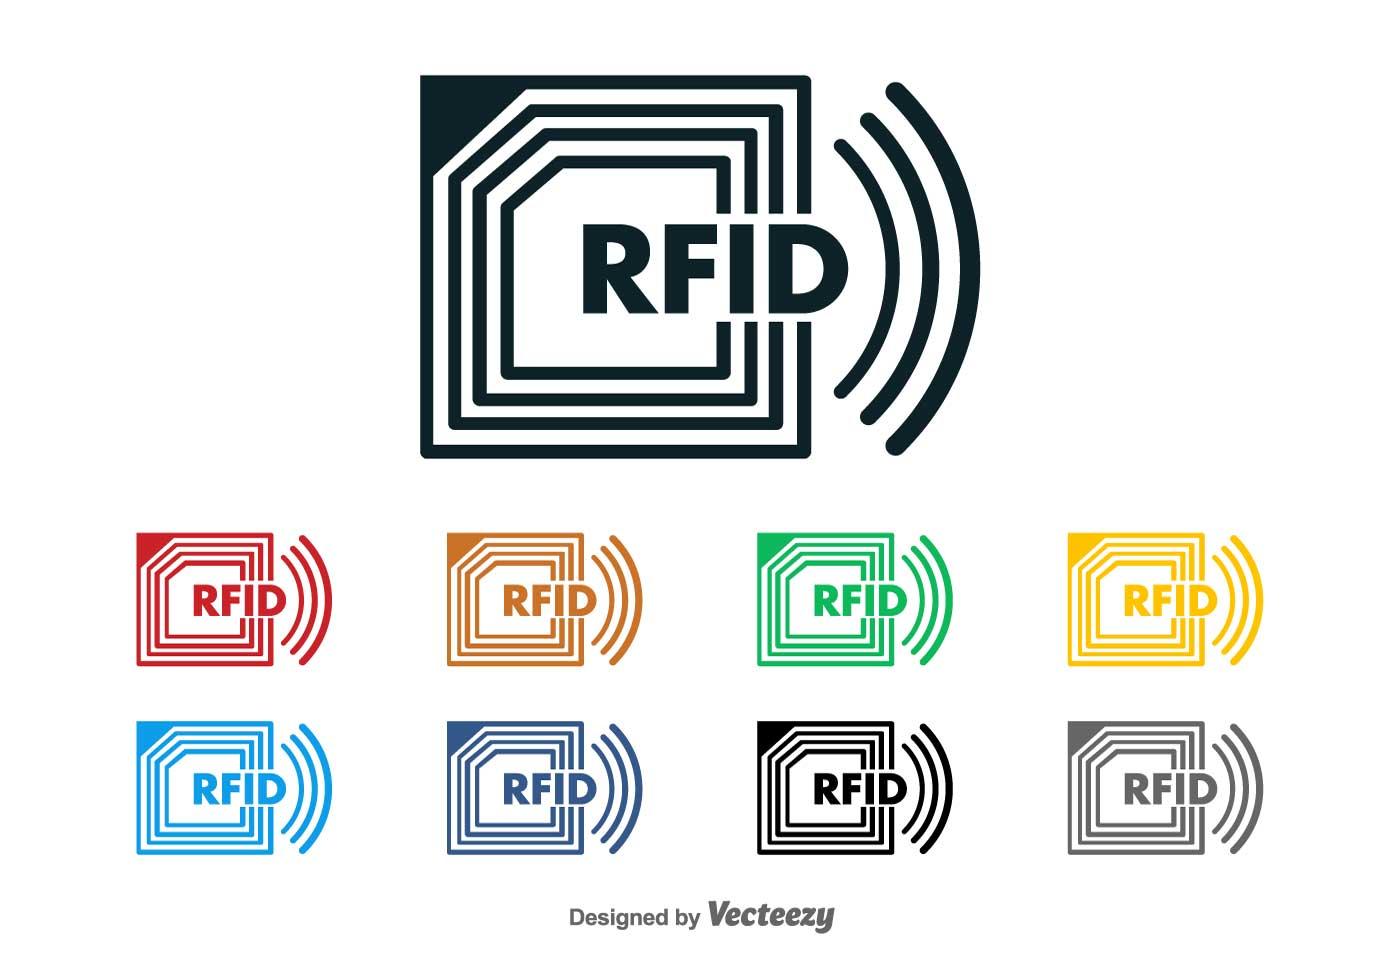 Rfid free vector art 7159 free downloads rfid chip vector logo buycottarizona